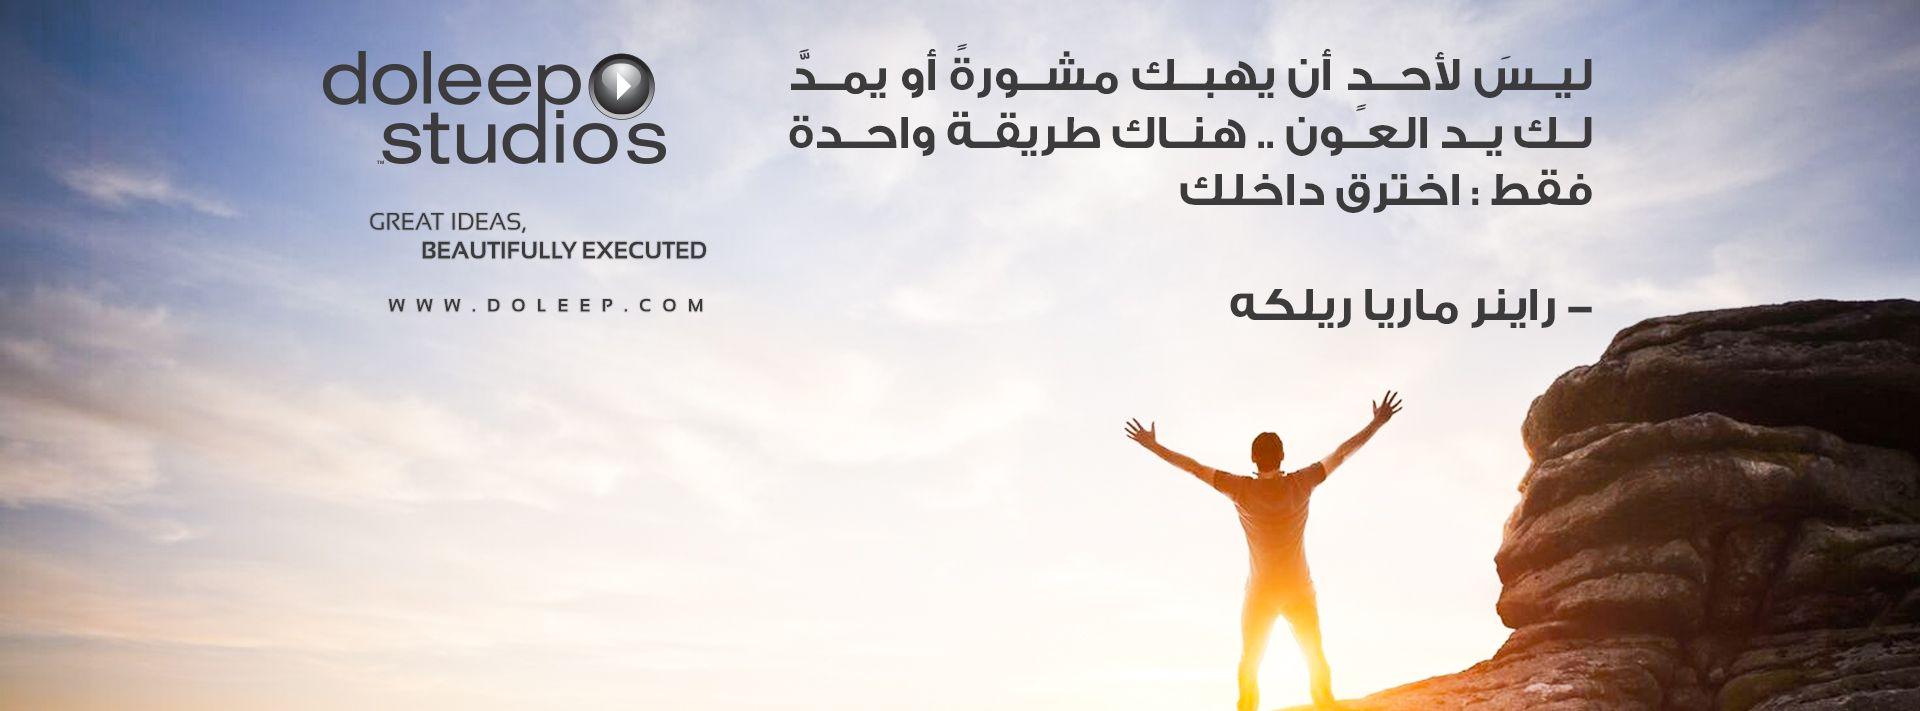 ليسَ لأحدٍ أن يهبك مشورةً أو يمدَّ لك يد العون .. هناك طريقة واحدة فقط : اخترق داخلك. #business #entrepreneur #fortune #leadership #CEO #achievement #greatideas #quote #vision #foresight #success #quality #motivation #inspiration #inspirationalquotes #domore #dubai #abudhabi #uae www.doleep.com/